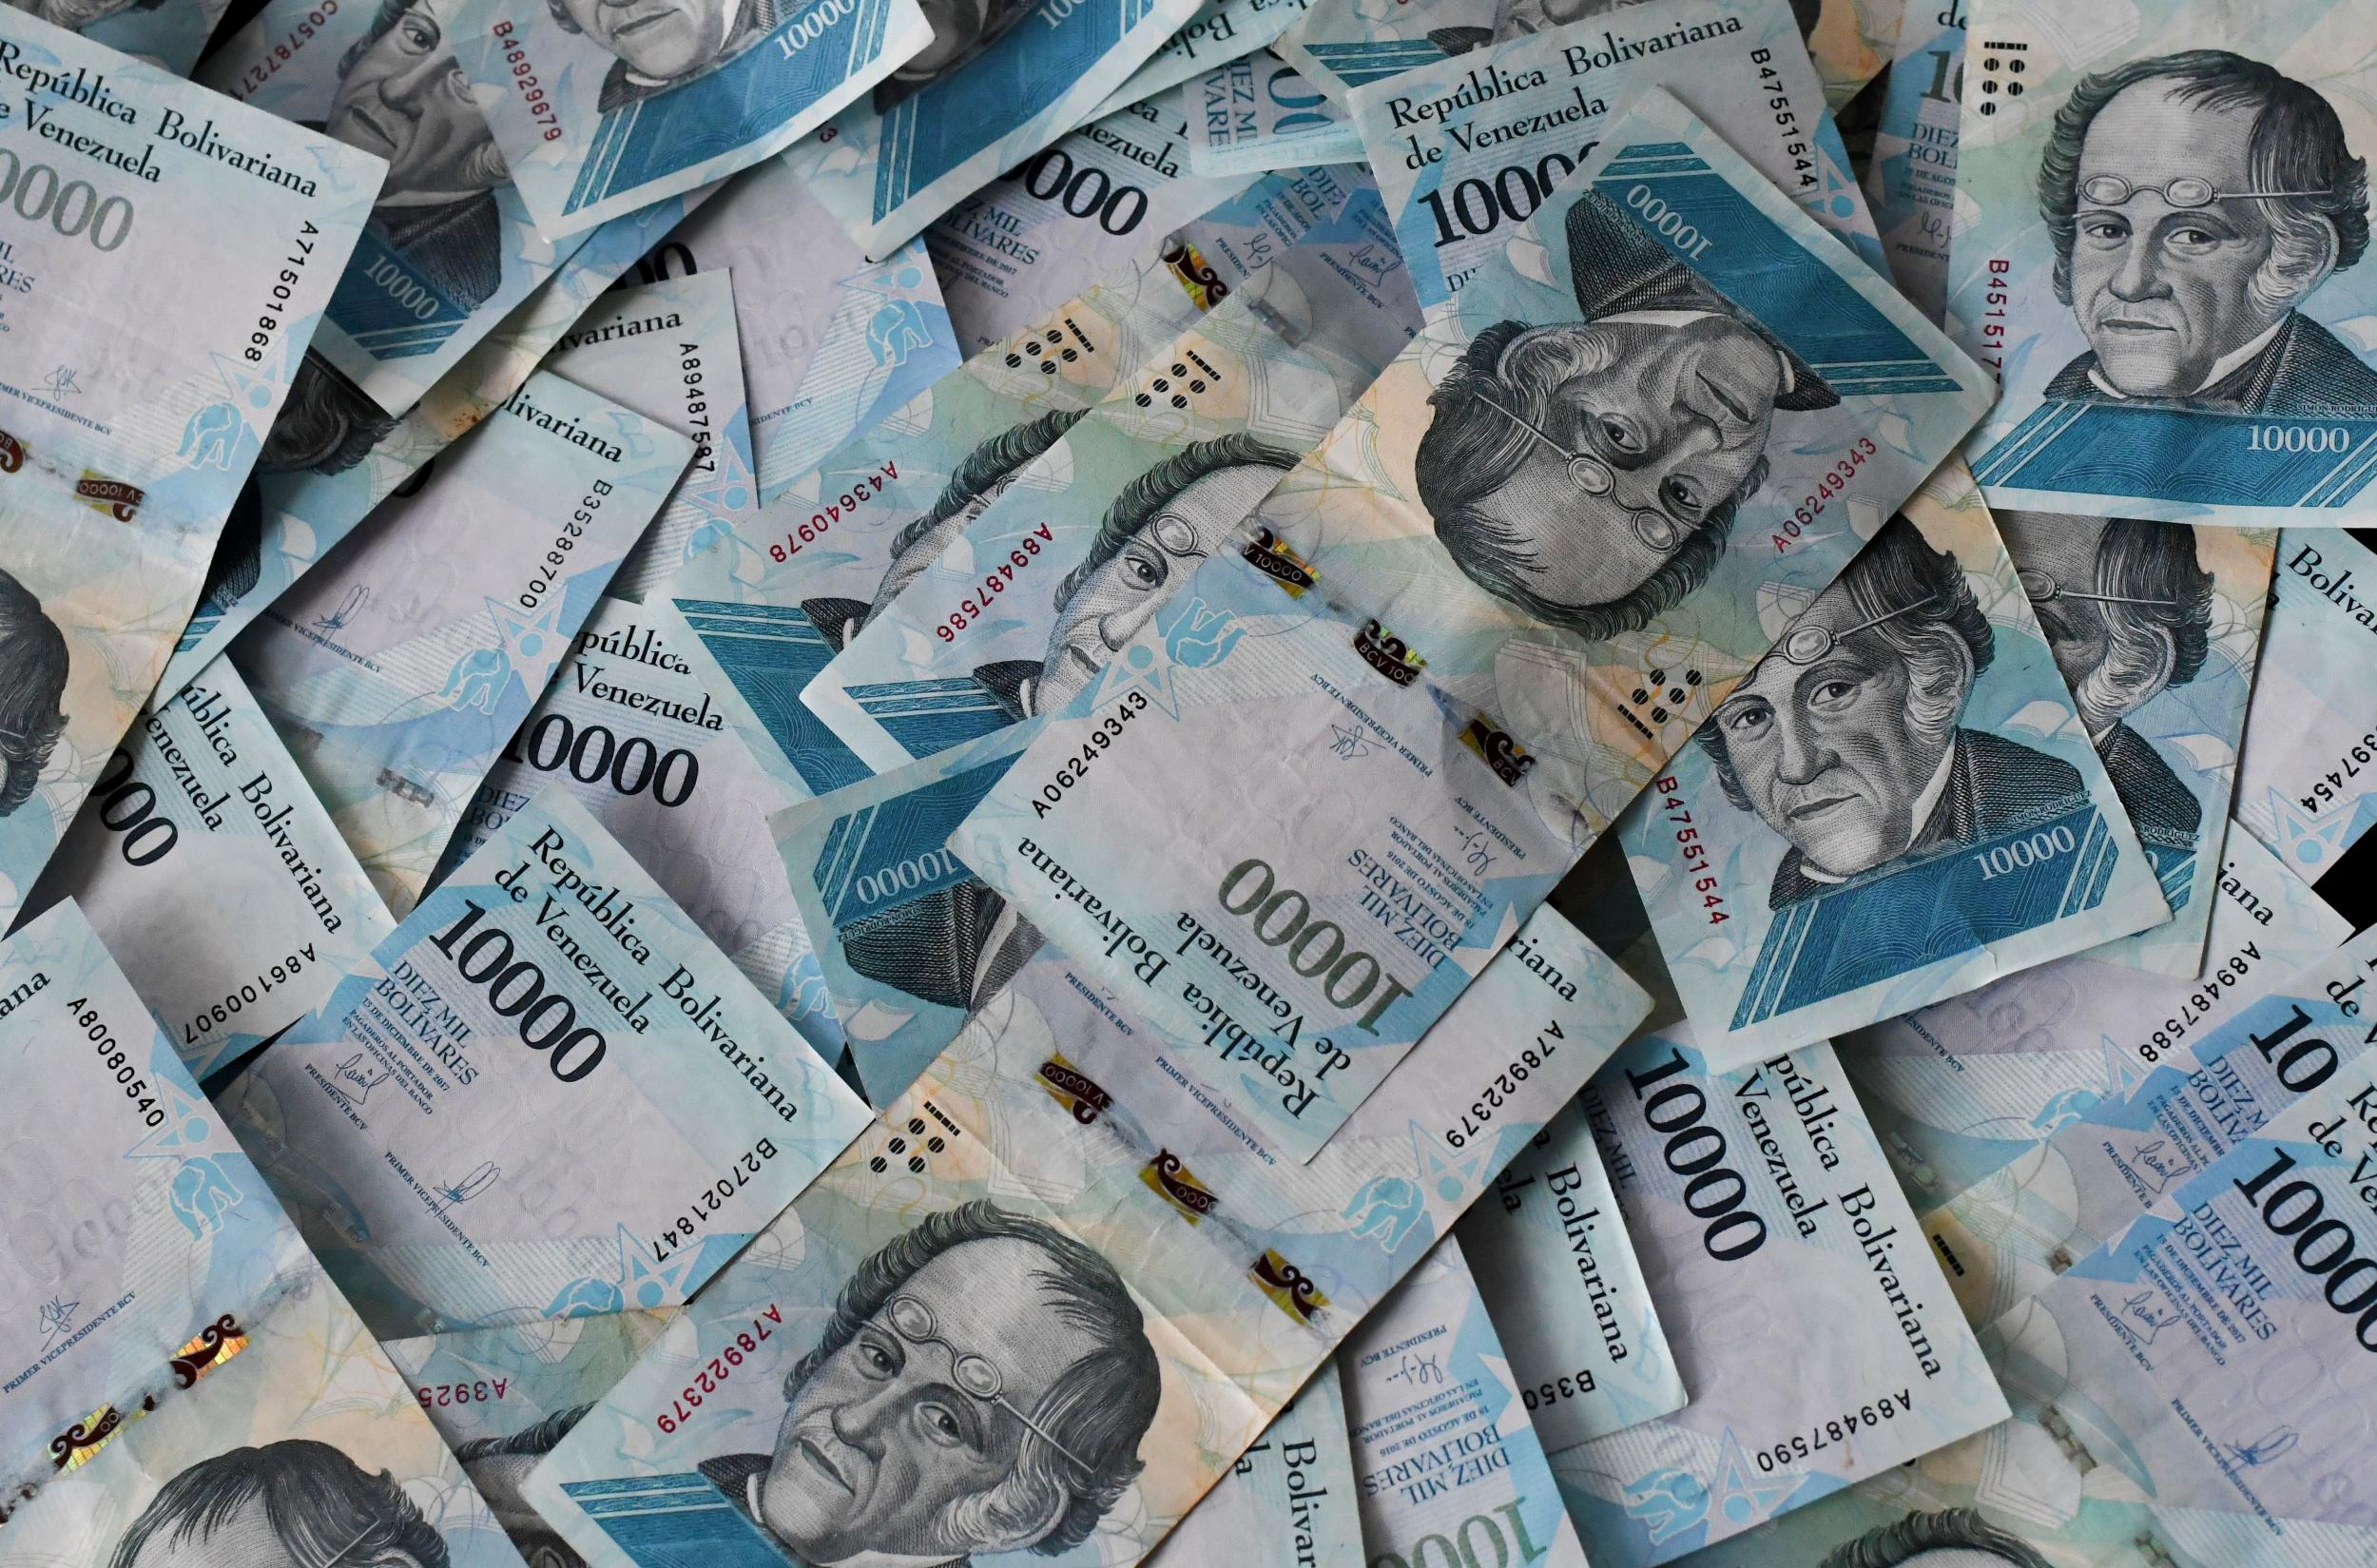 10000-bolívar bills